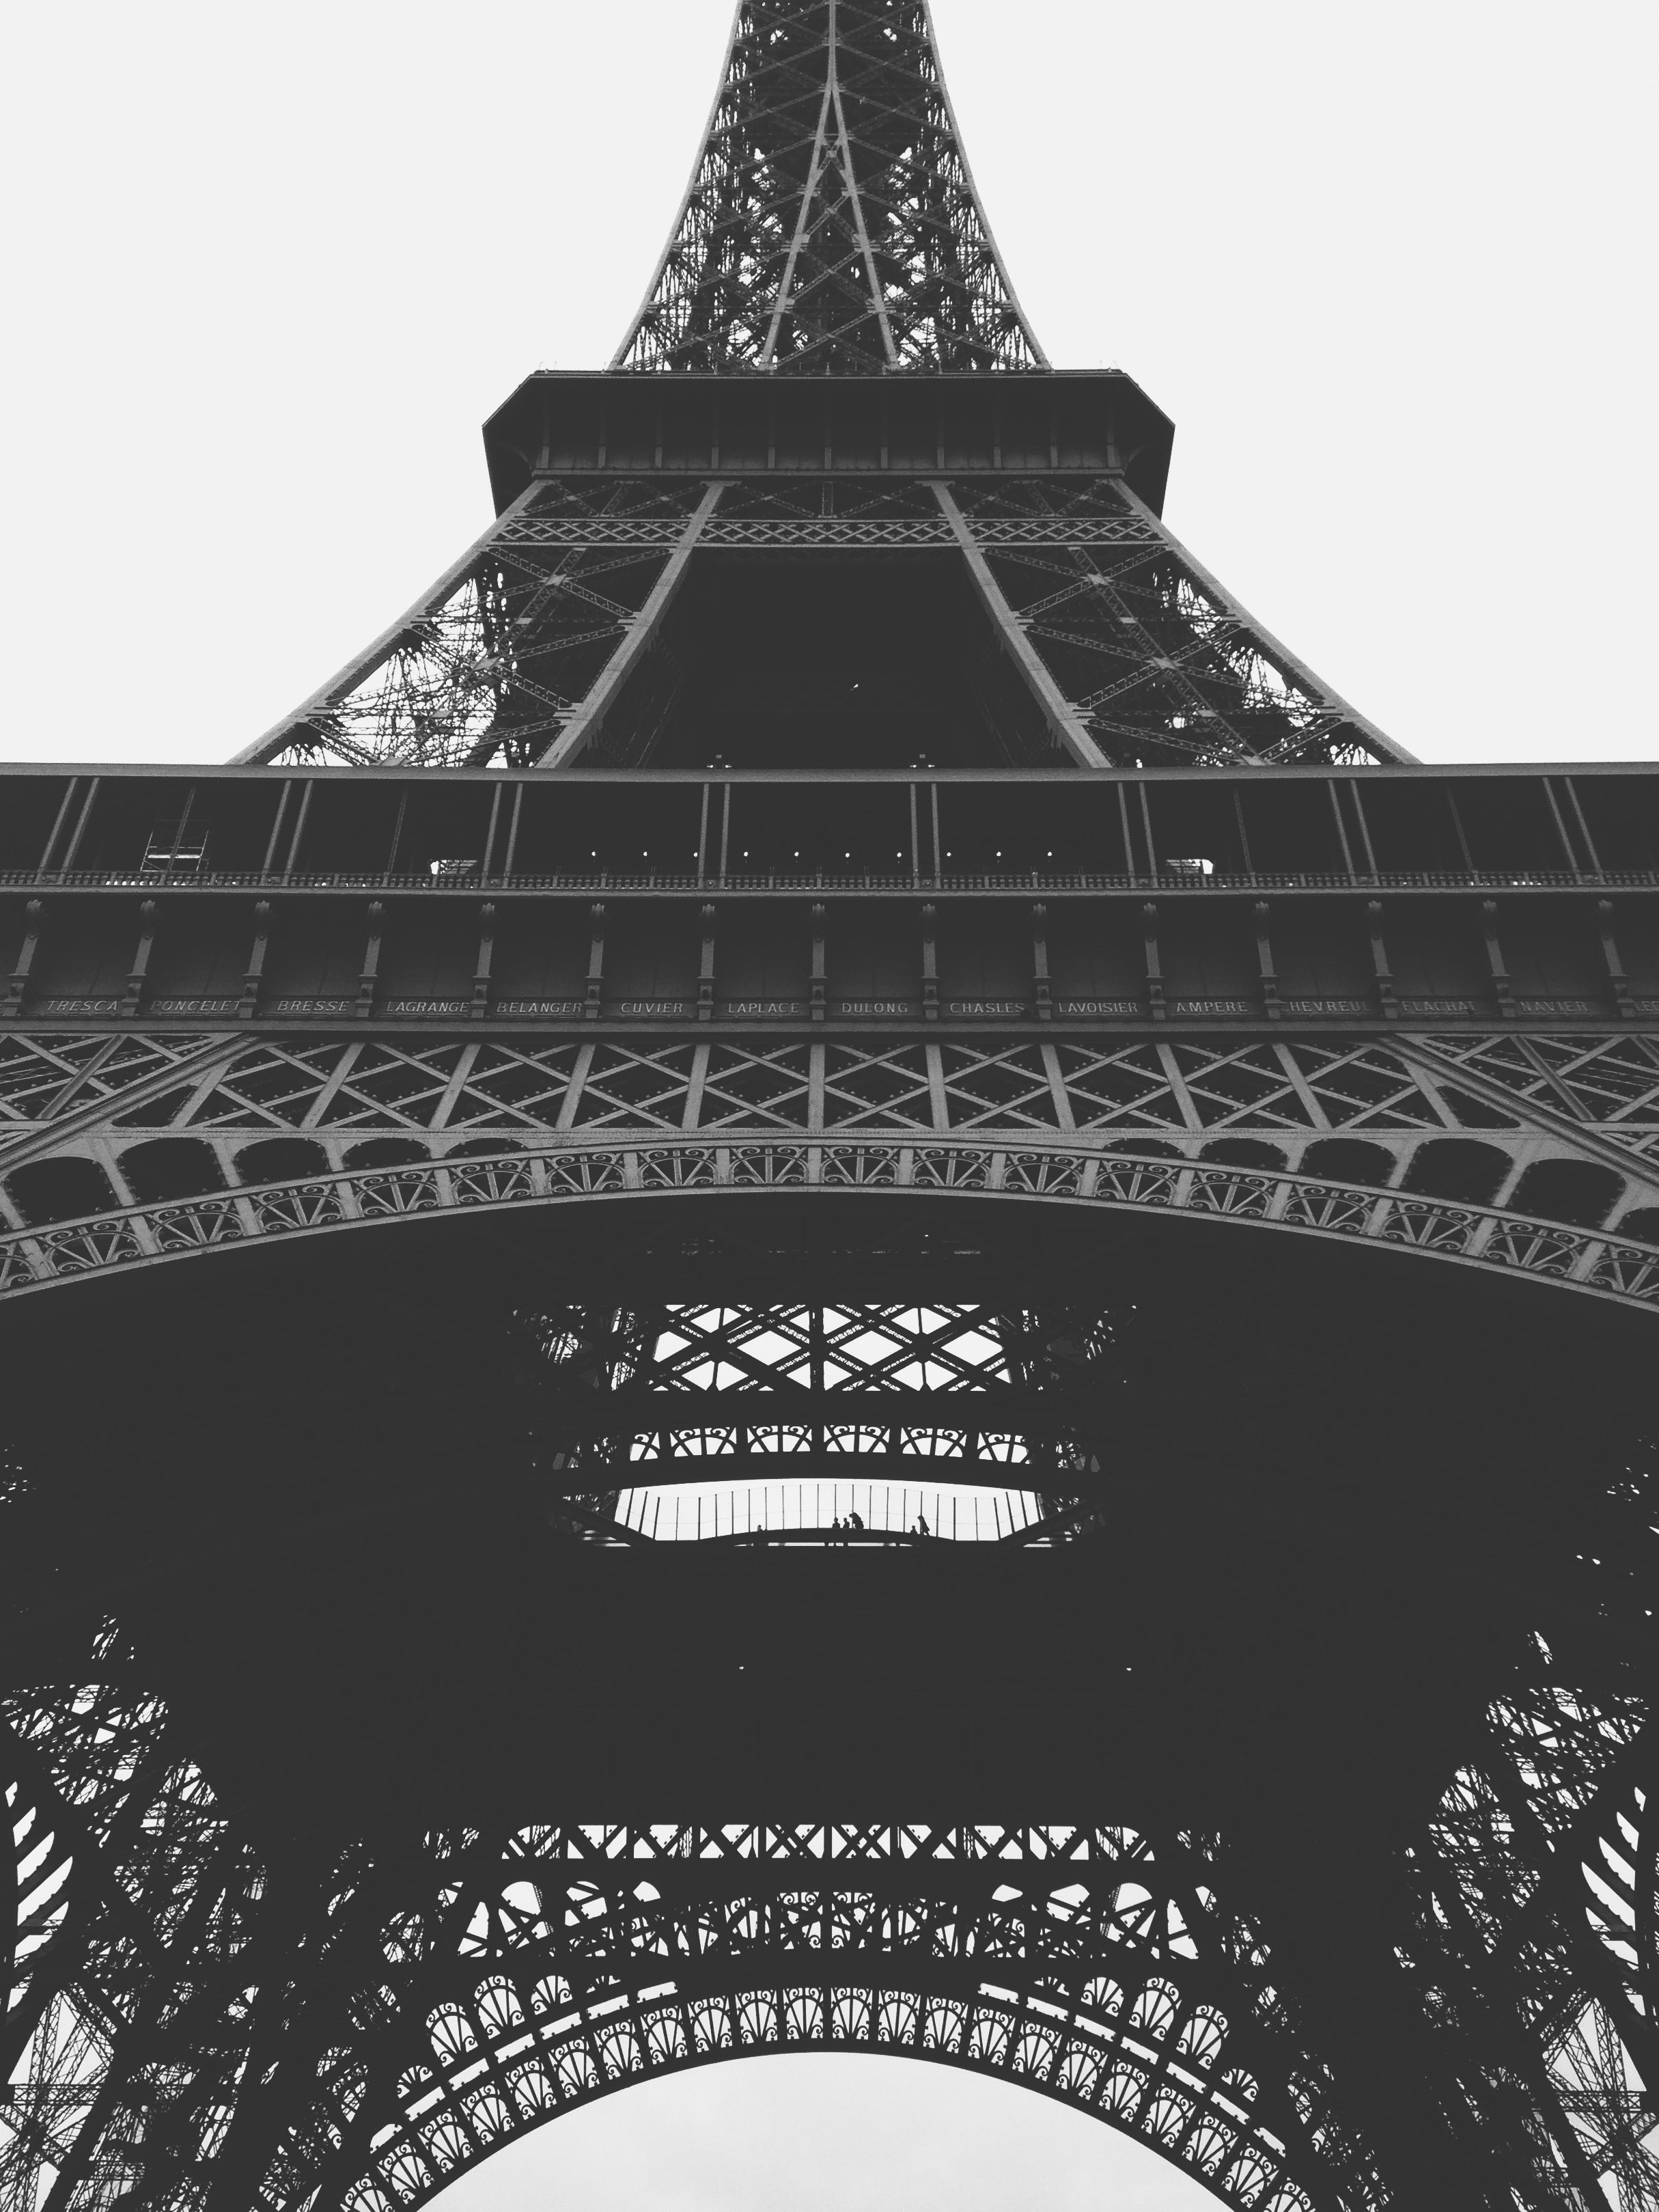 SecParis: Security Meetups in Paris